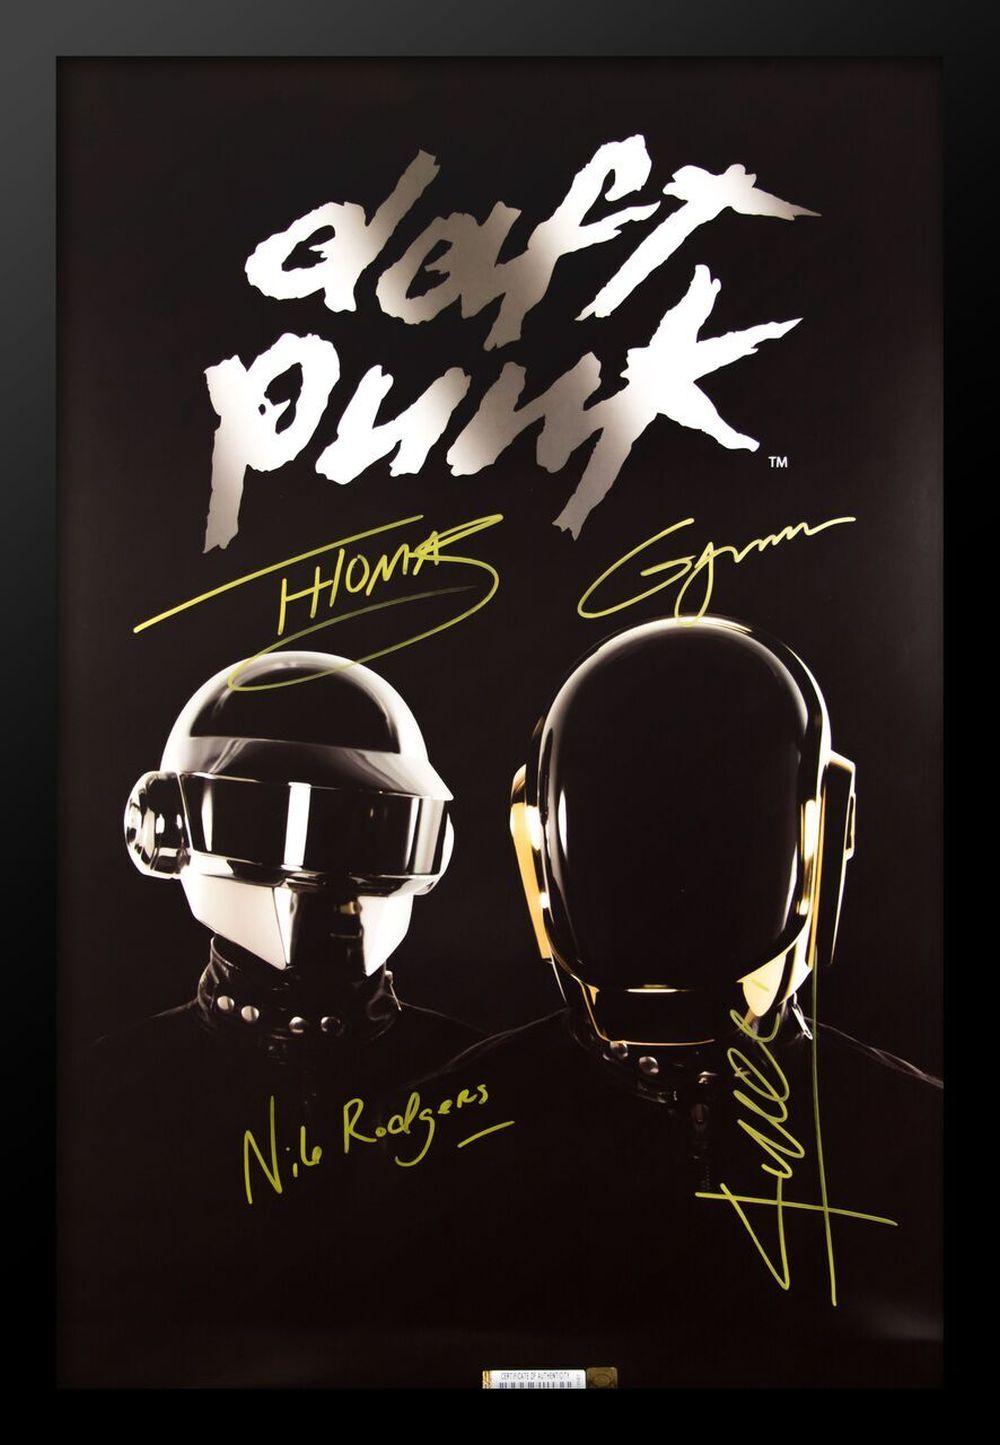 Daft Punk Signed Music Poster